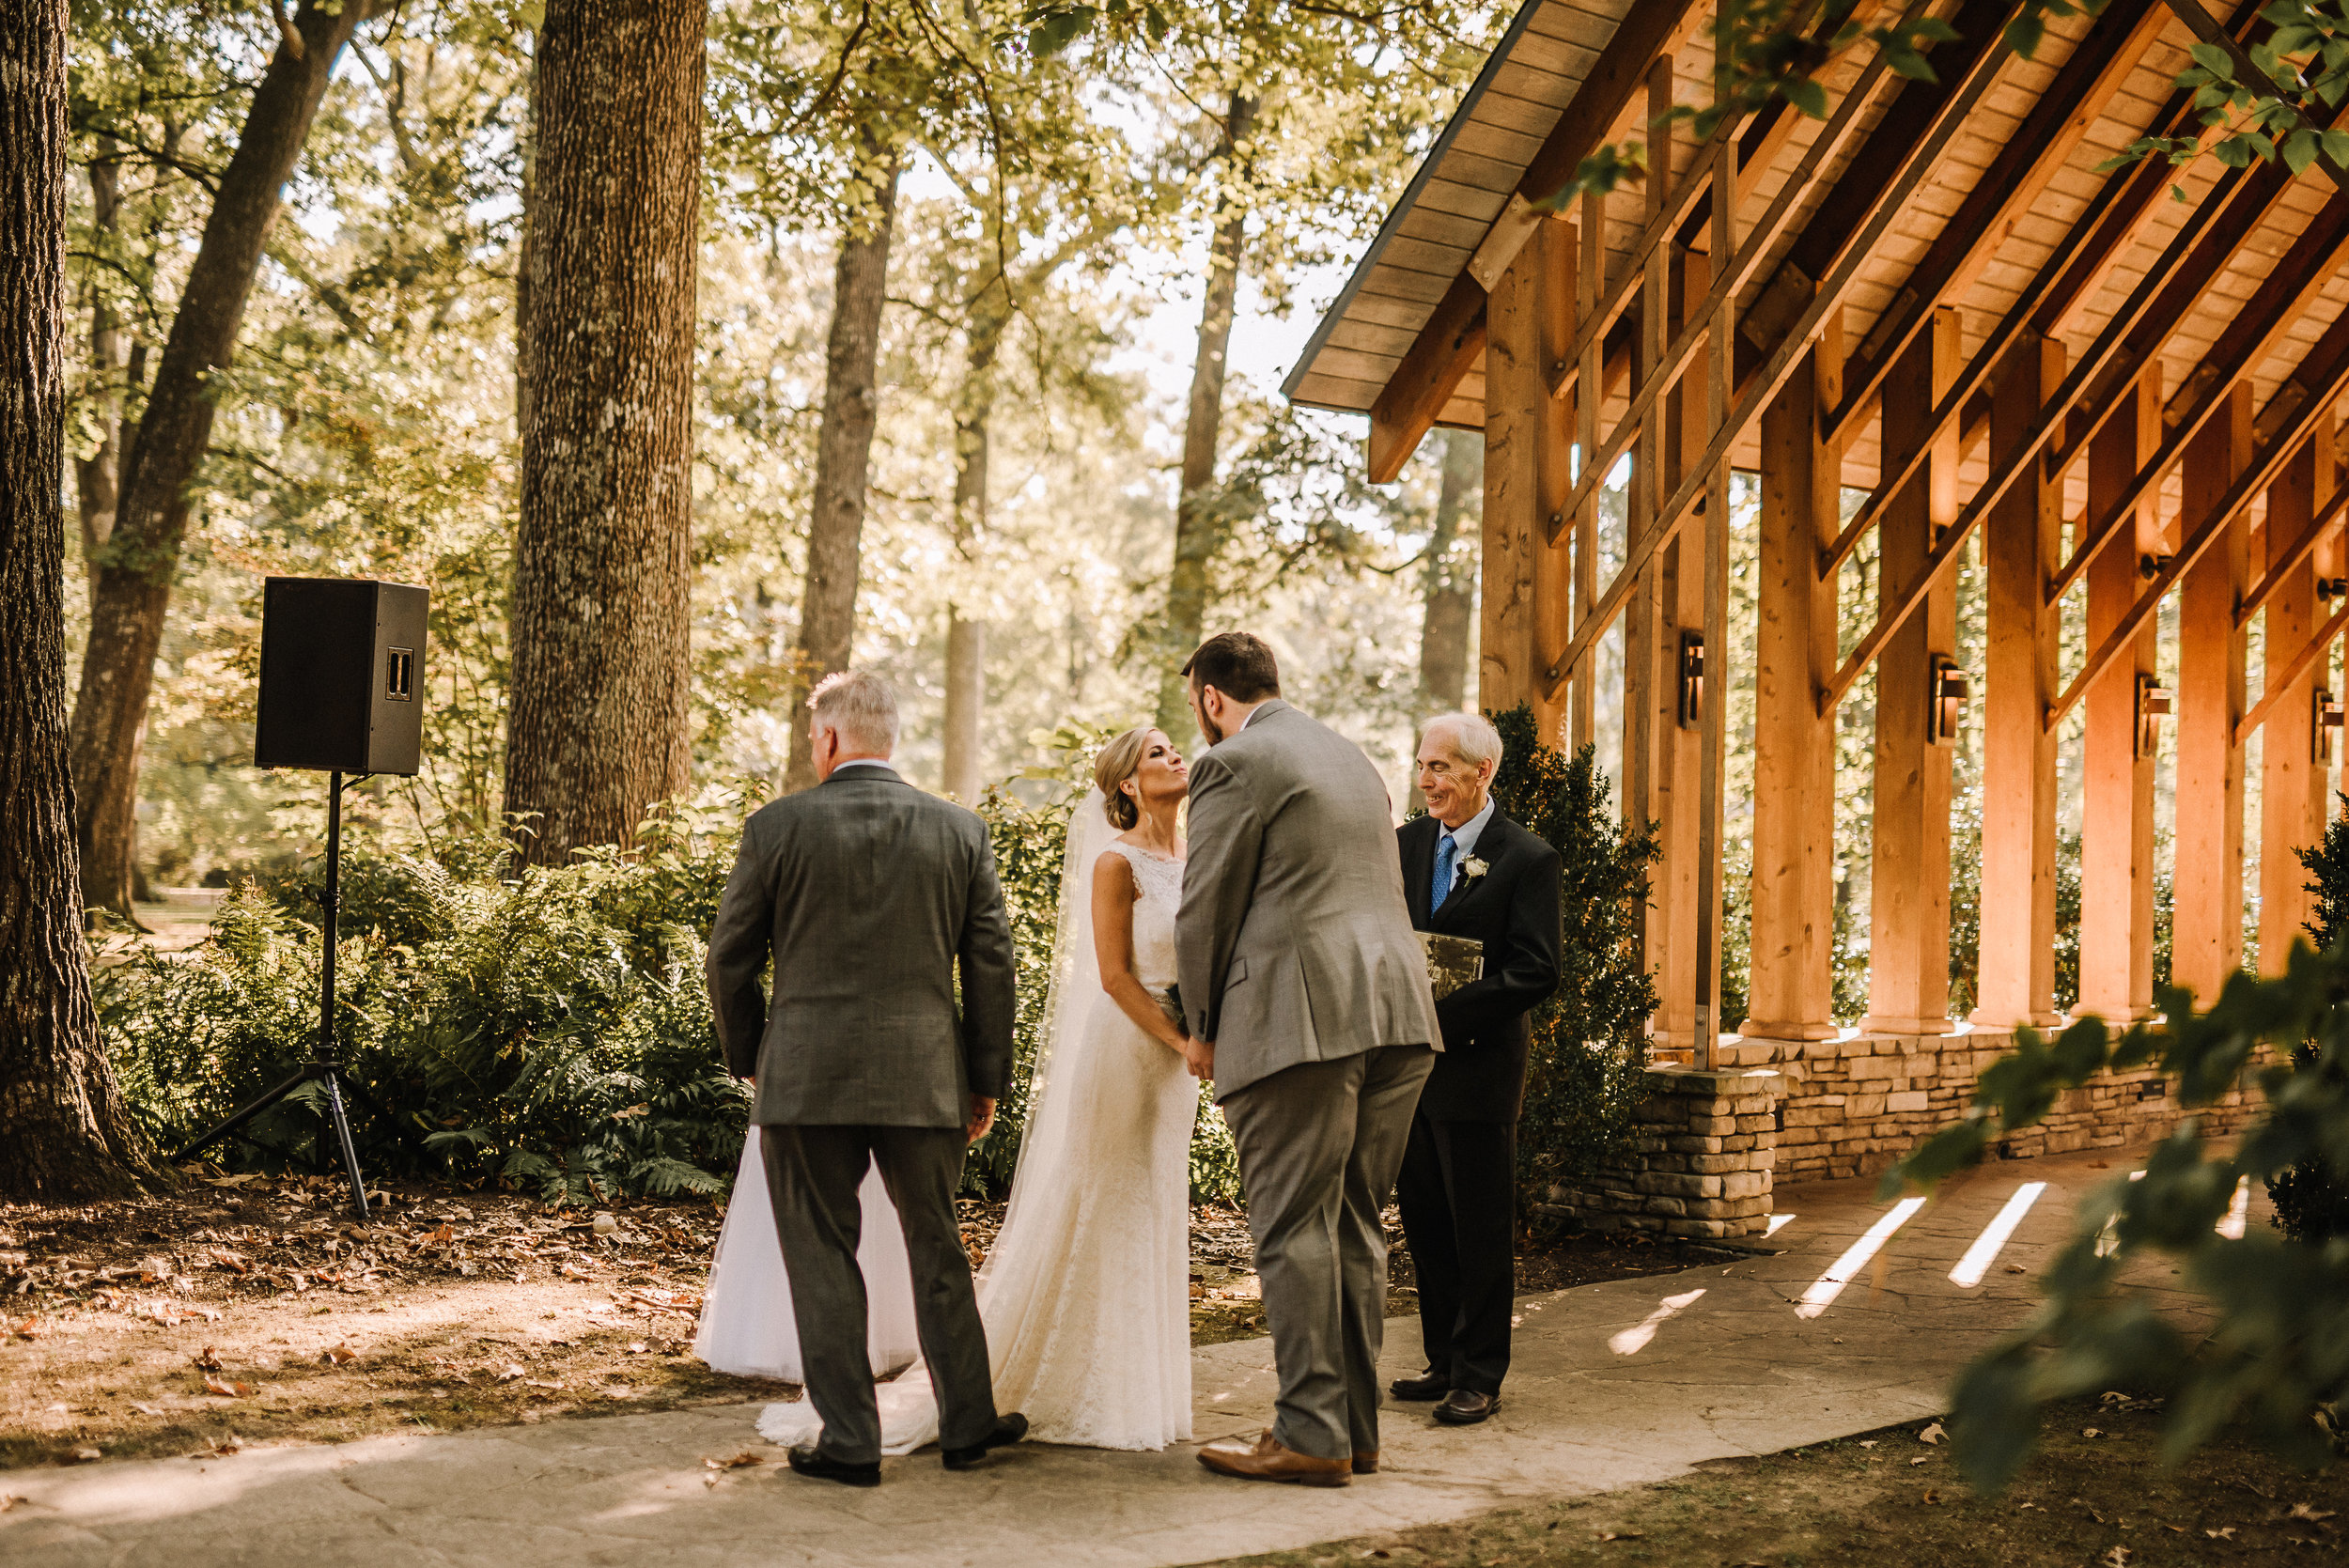 O'Brien-Wedding_Botanic-Gardens_Ashley-Benham-Photography-350.jpg